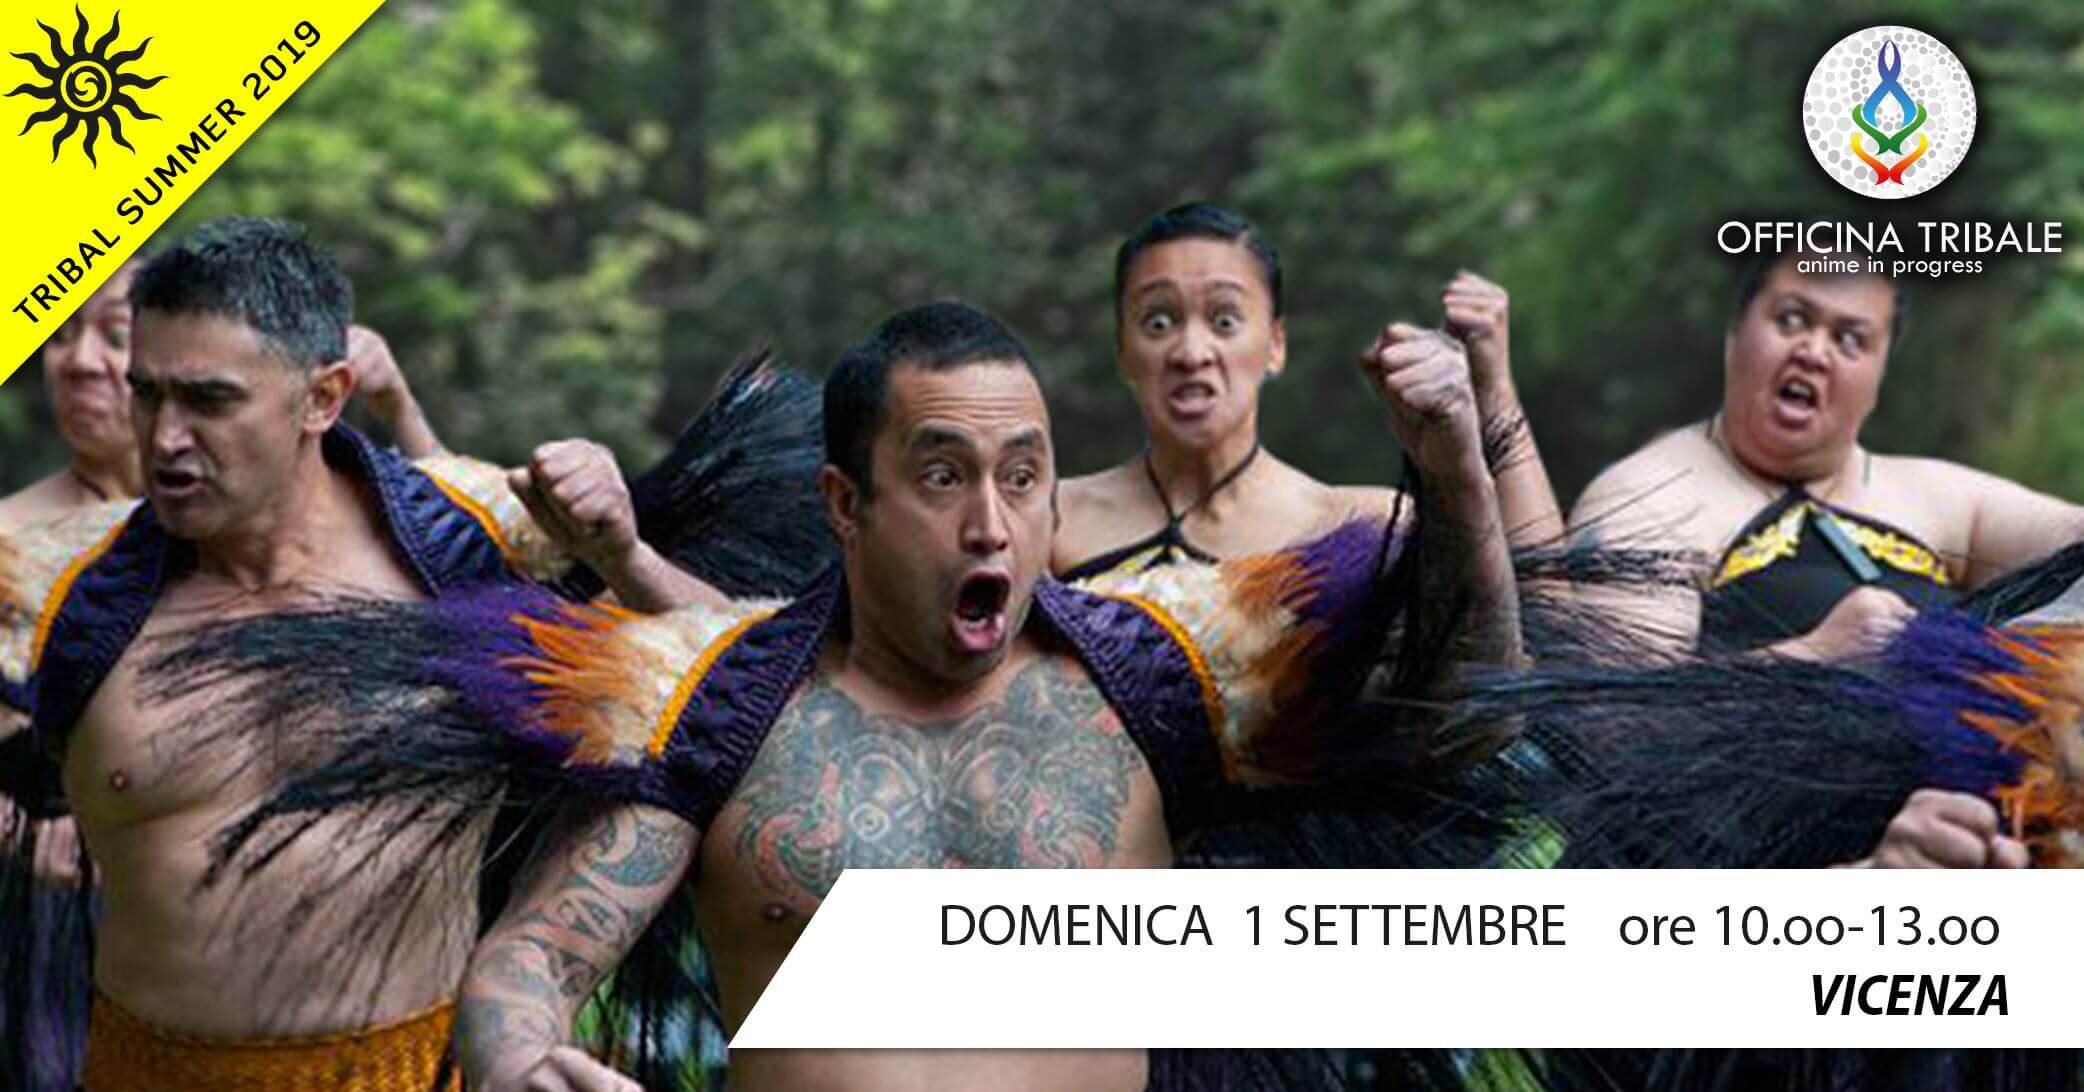 Tribal Summer 2019: HAKA! workshop DOMENICA 1 SETTEMBRE